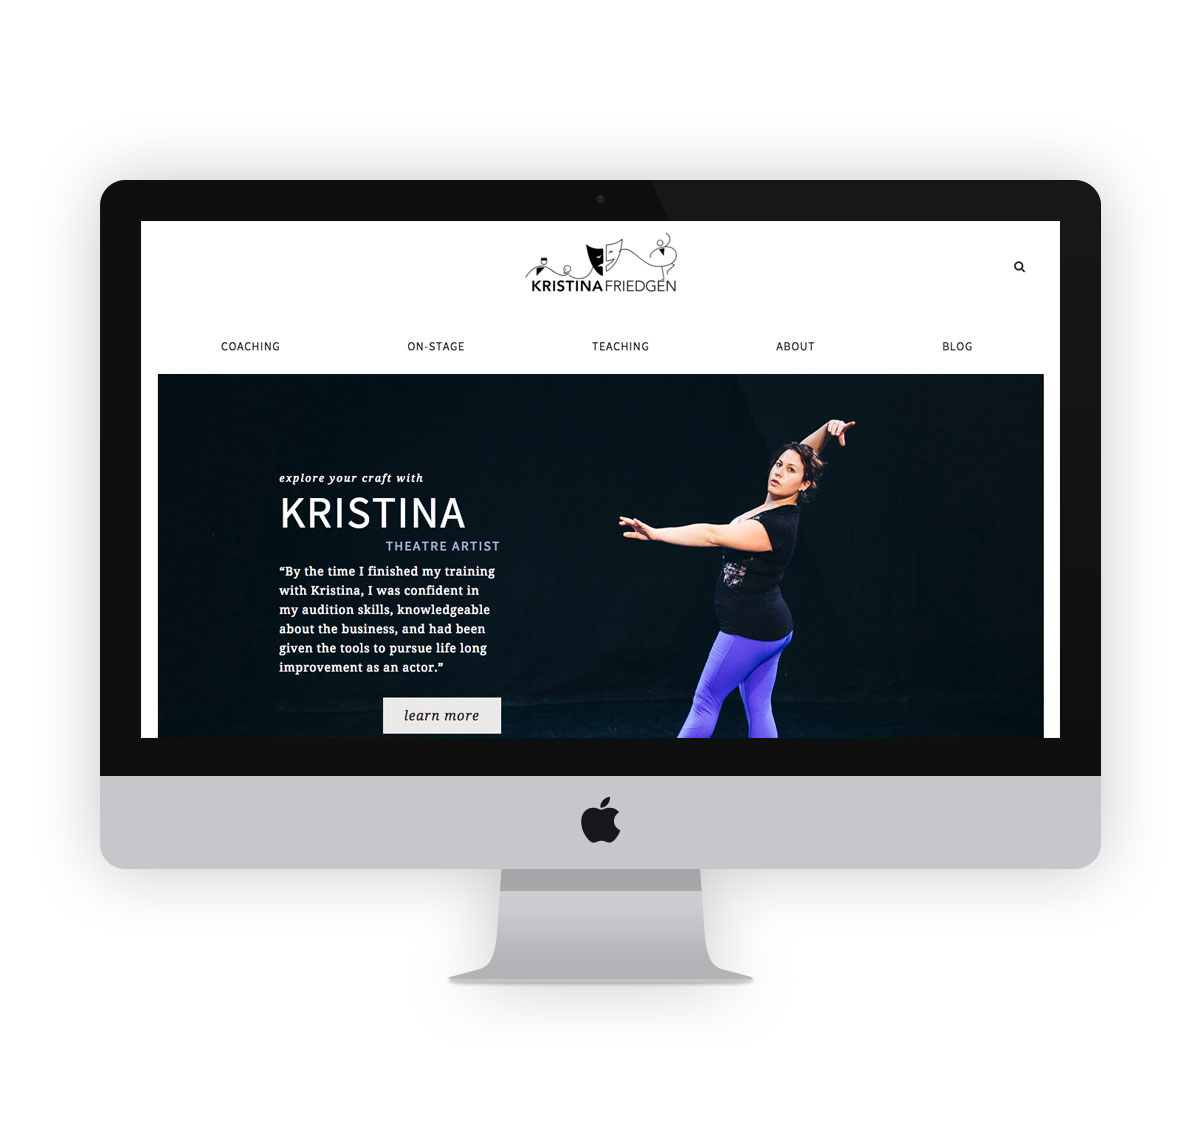 kristina_friedgen_homepage_desktop_lg